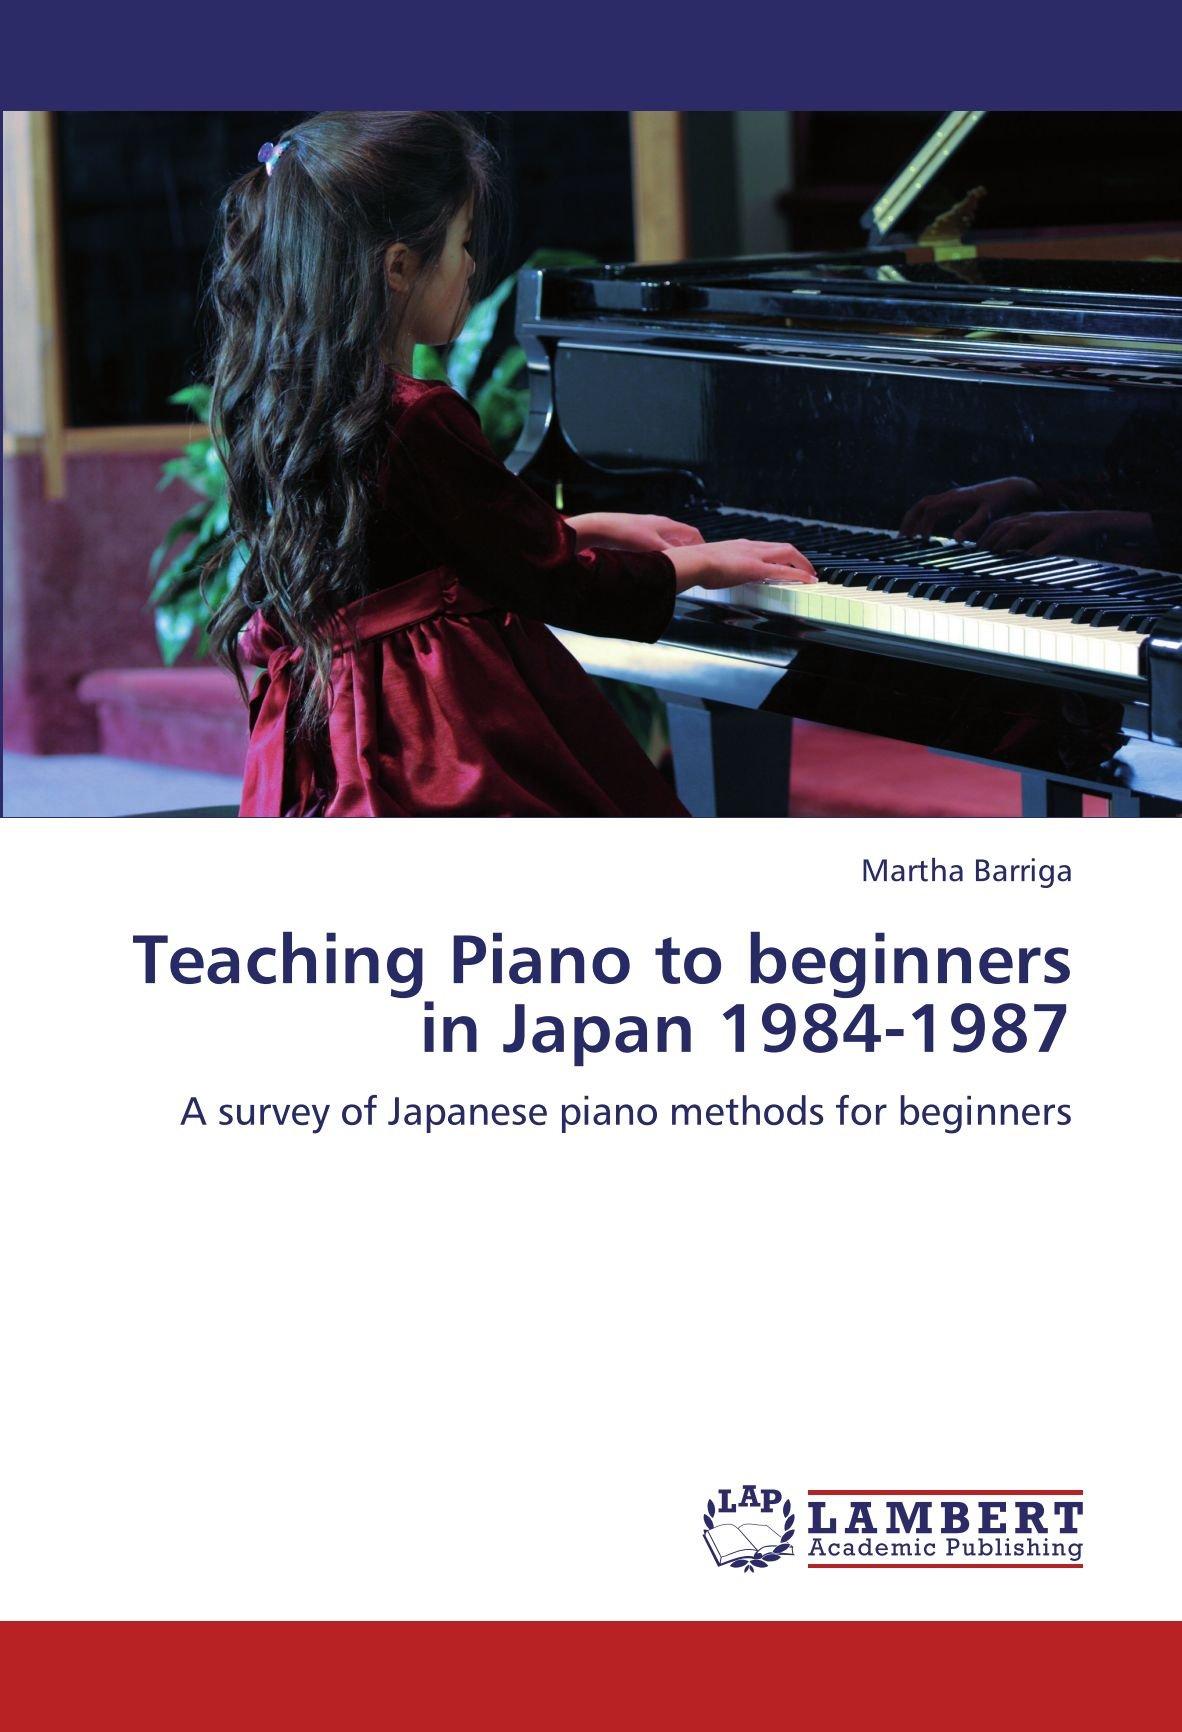 Barriga, M: Teaching Piano to beginners in Japan 1984-1987 ...